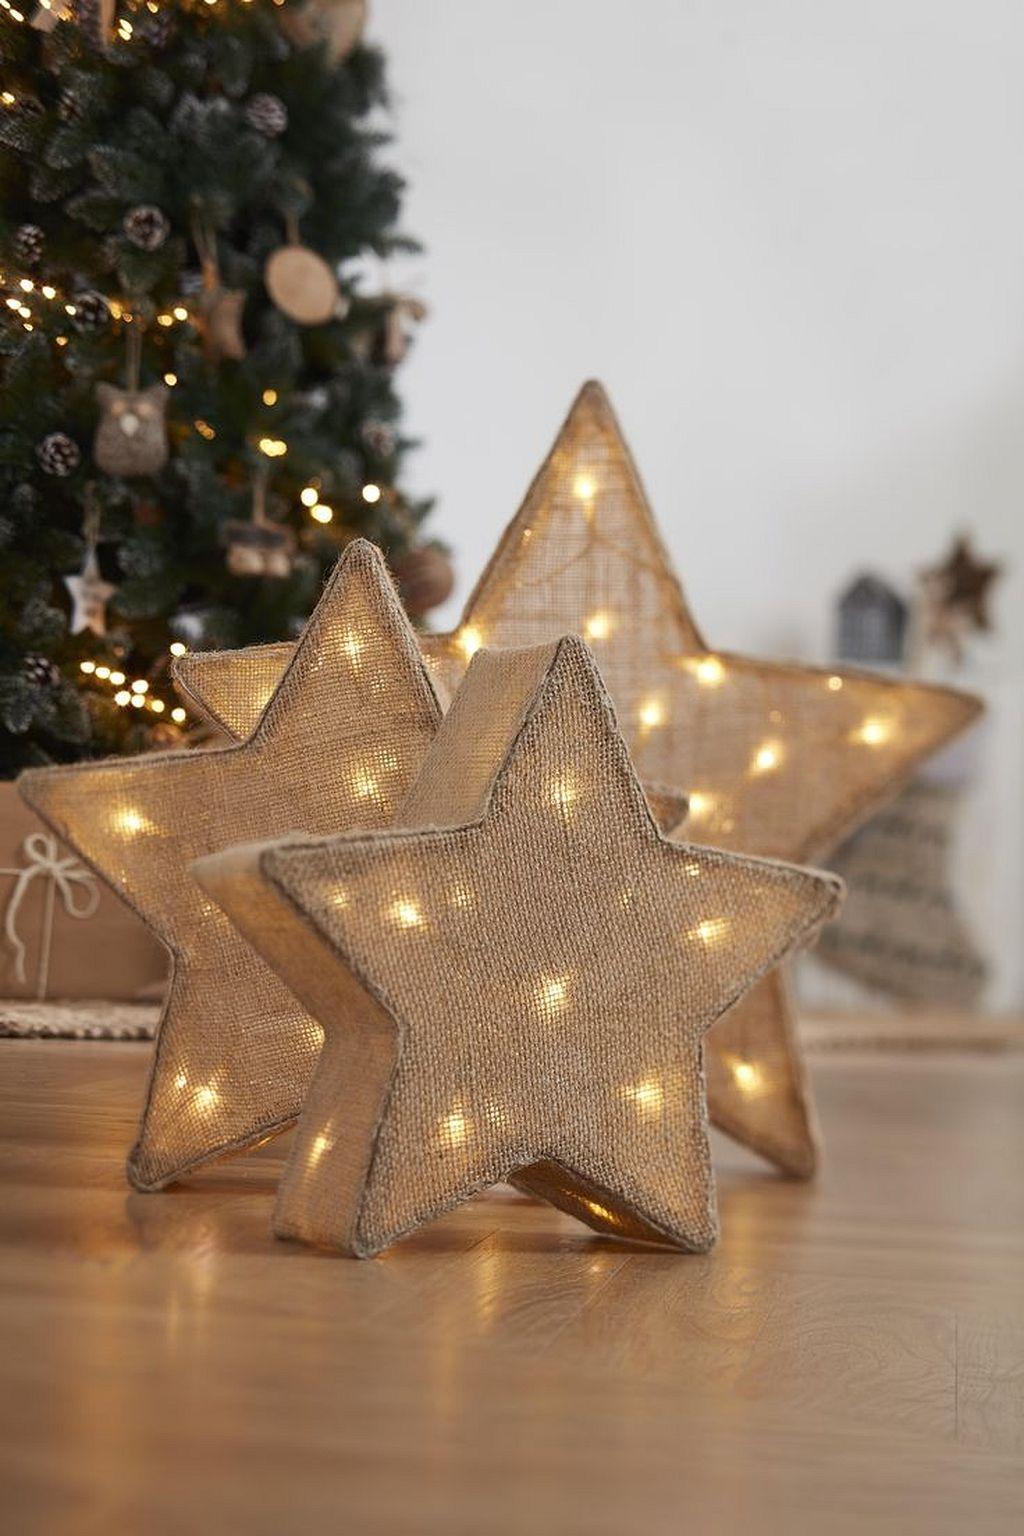 Gorgeous 30 Smart Ideas Bringing The Christmas Spirit Into Your Kitchen Https Kidmagz Com 3 Christmas Lights Indoor Christmas Lights Hanging Christmas Lights